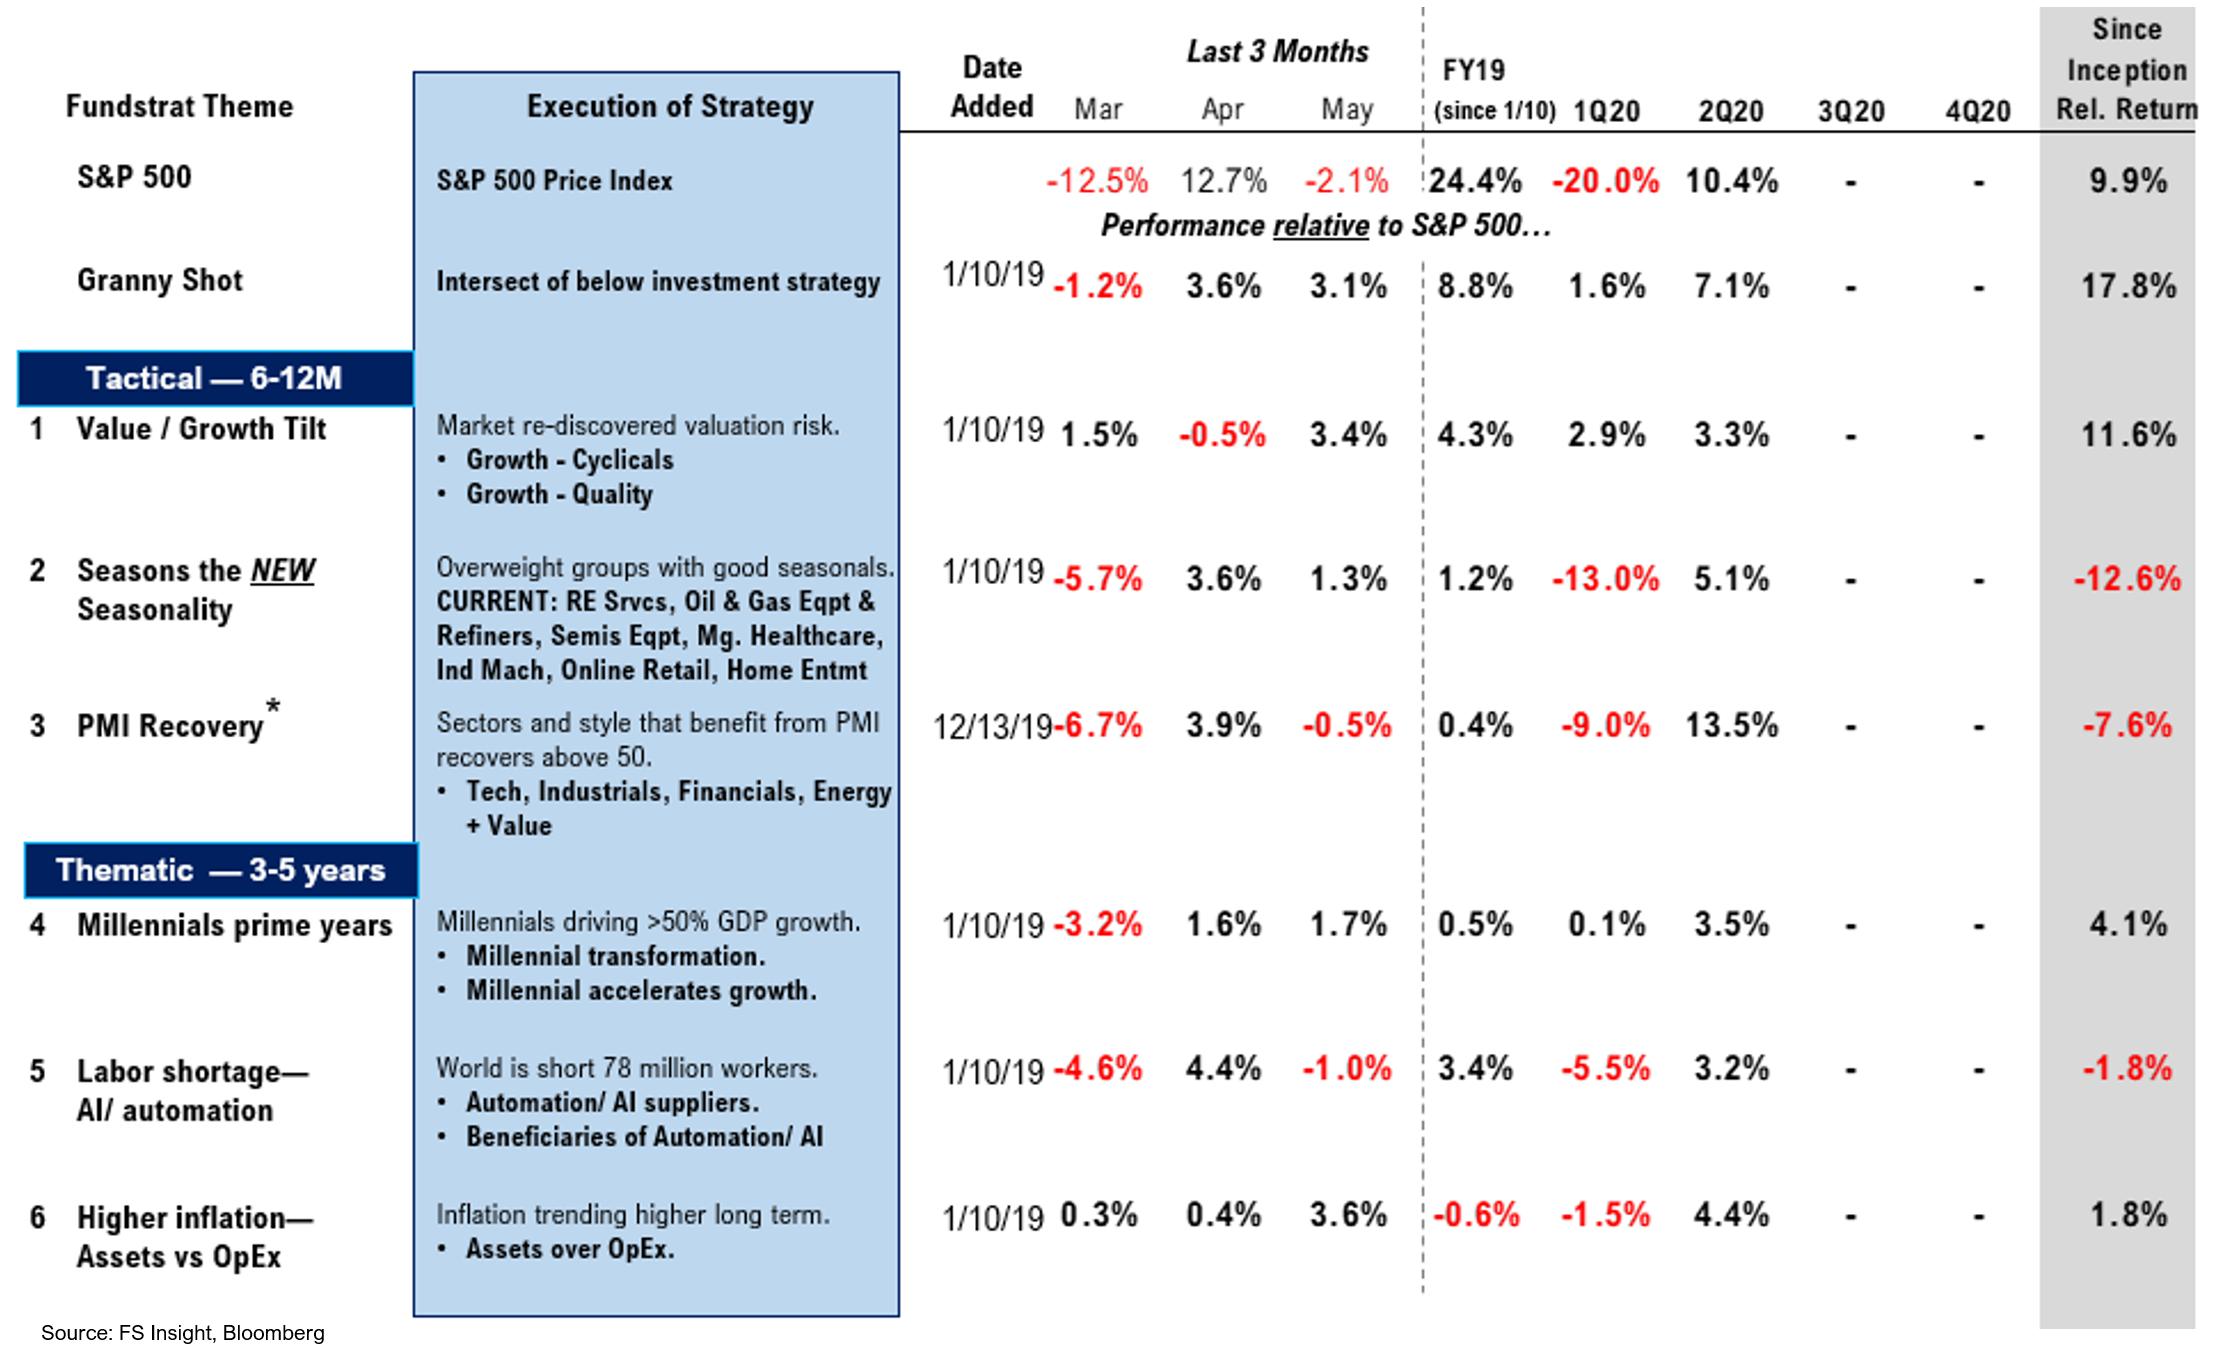 202005234 Progress in the COVID 19 Battle; Opportunity in Epicenter Stocks